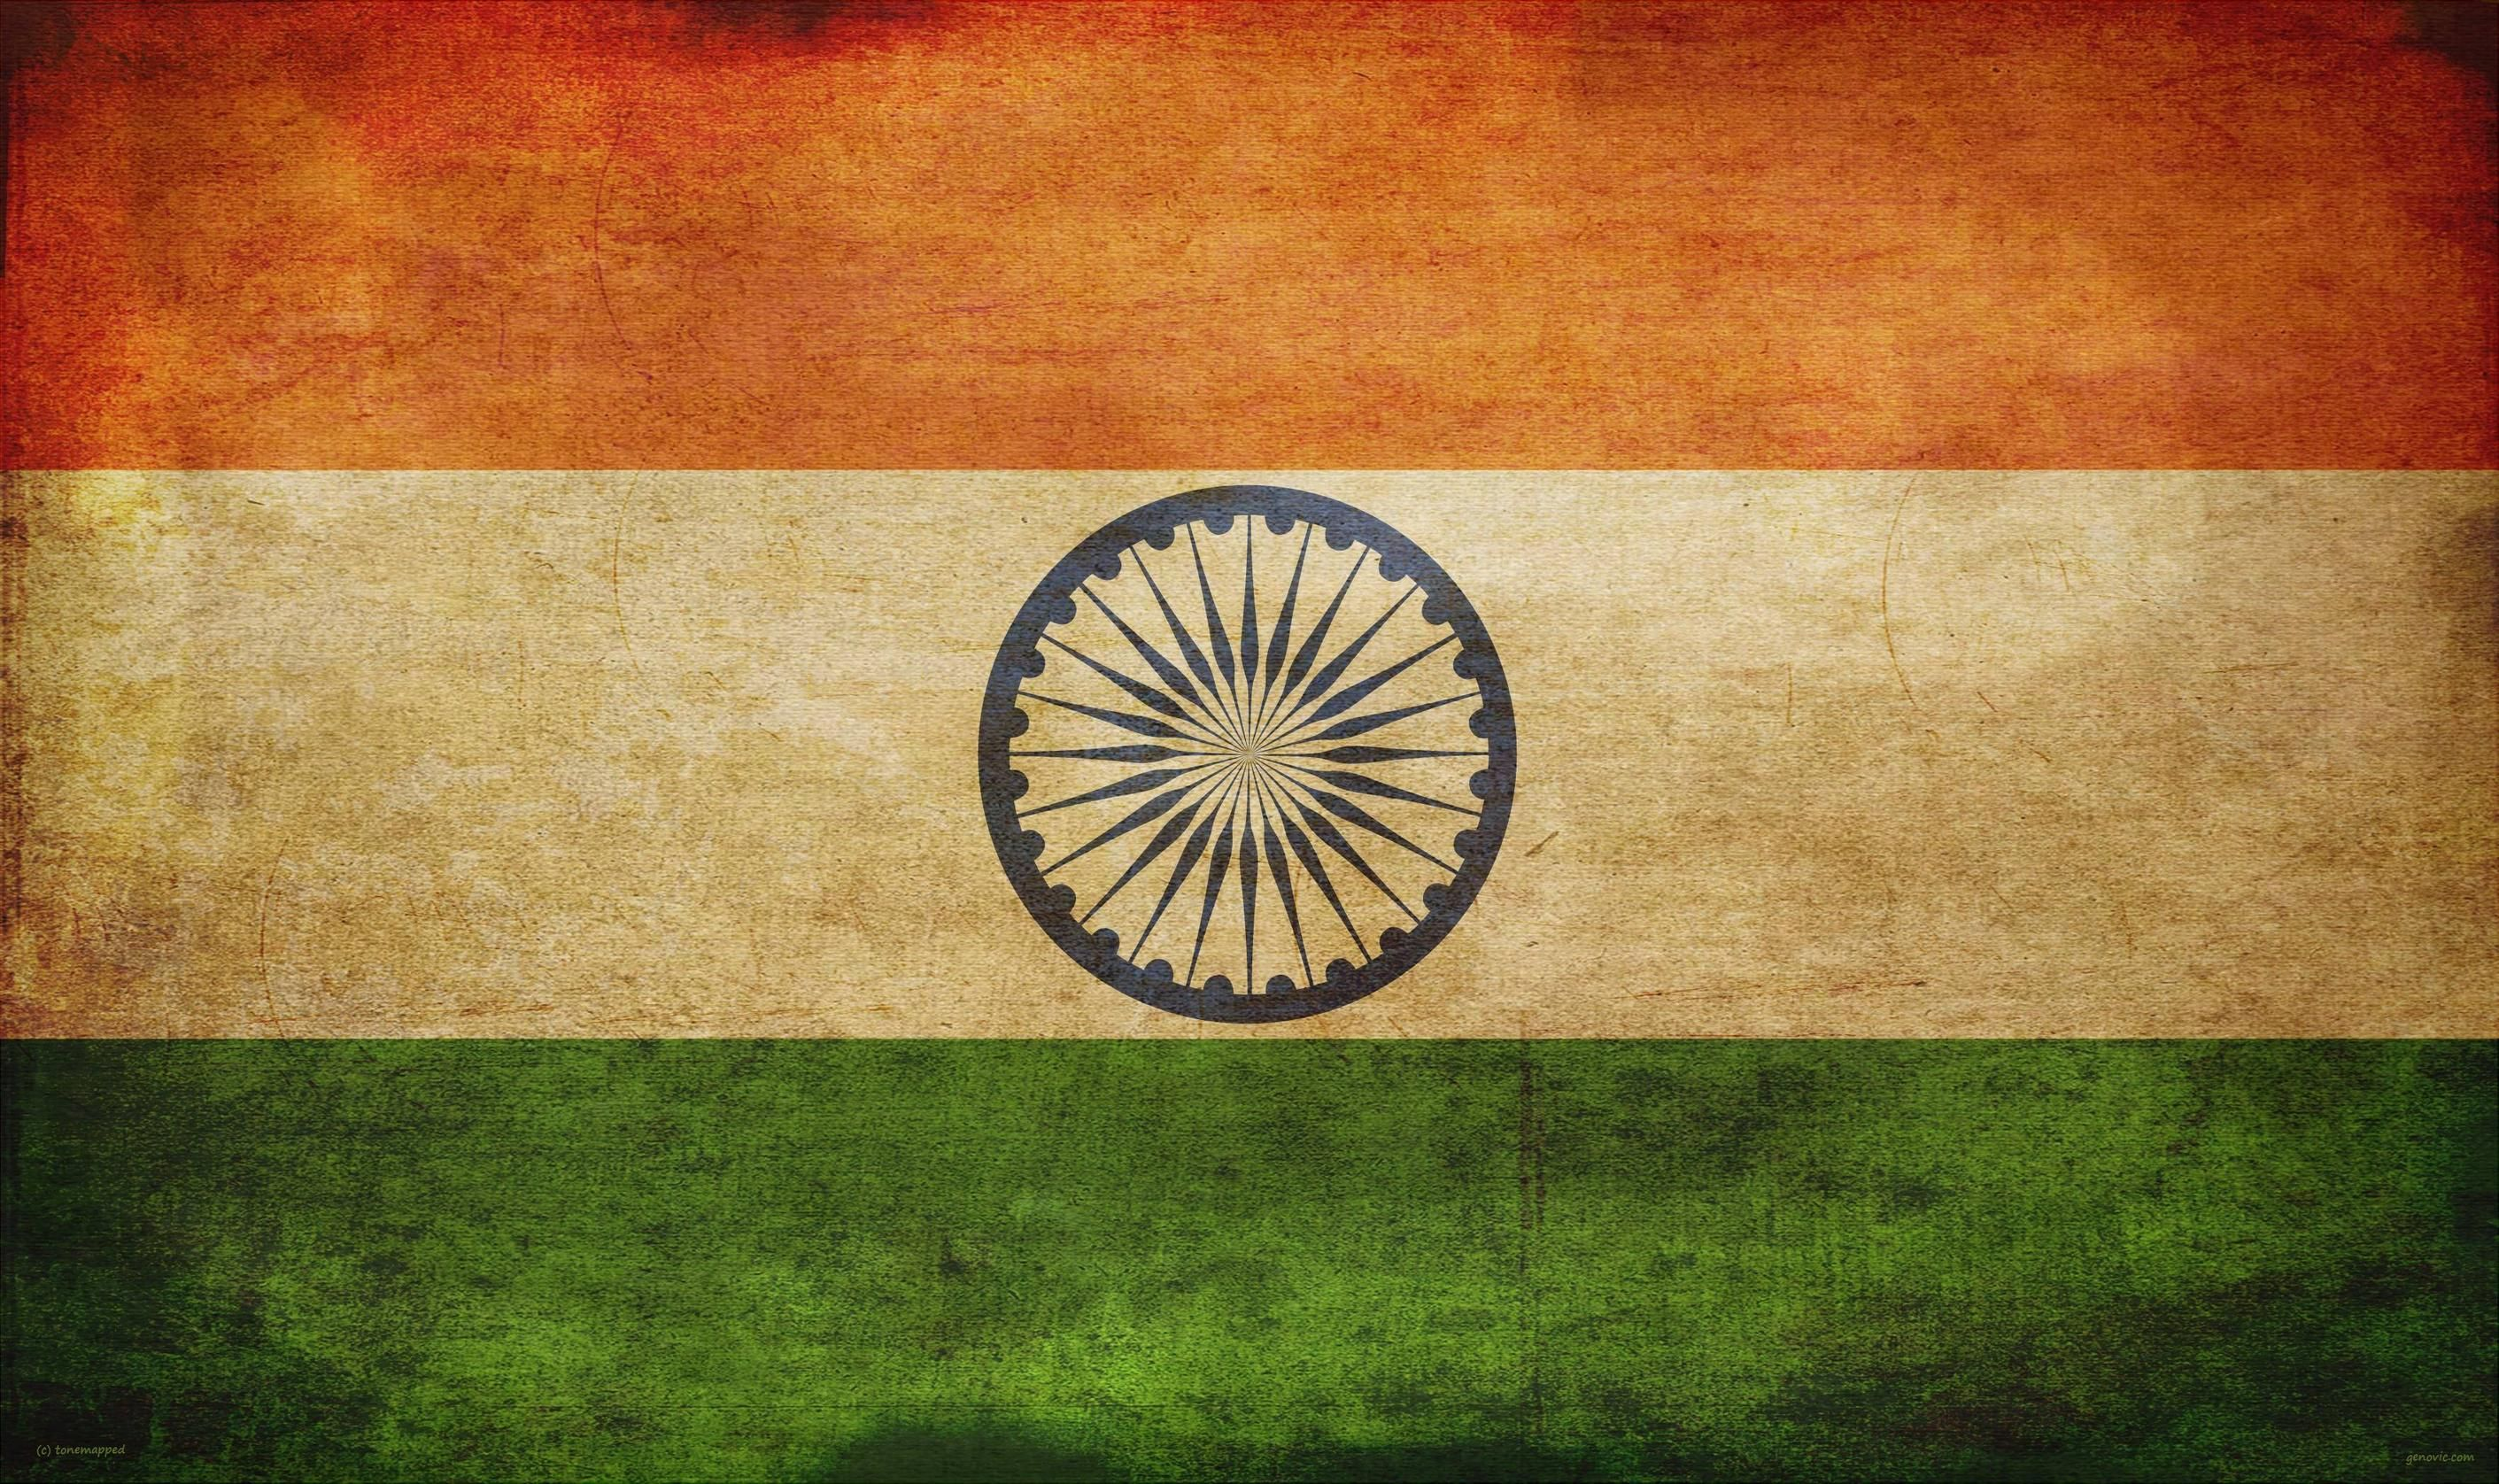 Hd wallpaper indian - Indian Flag Wallpaper Hd Free Download Hd Wallpapers